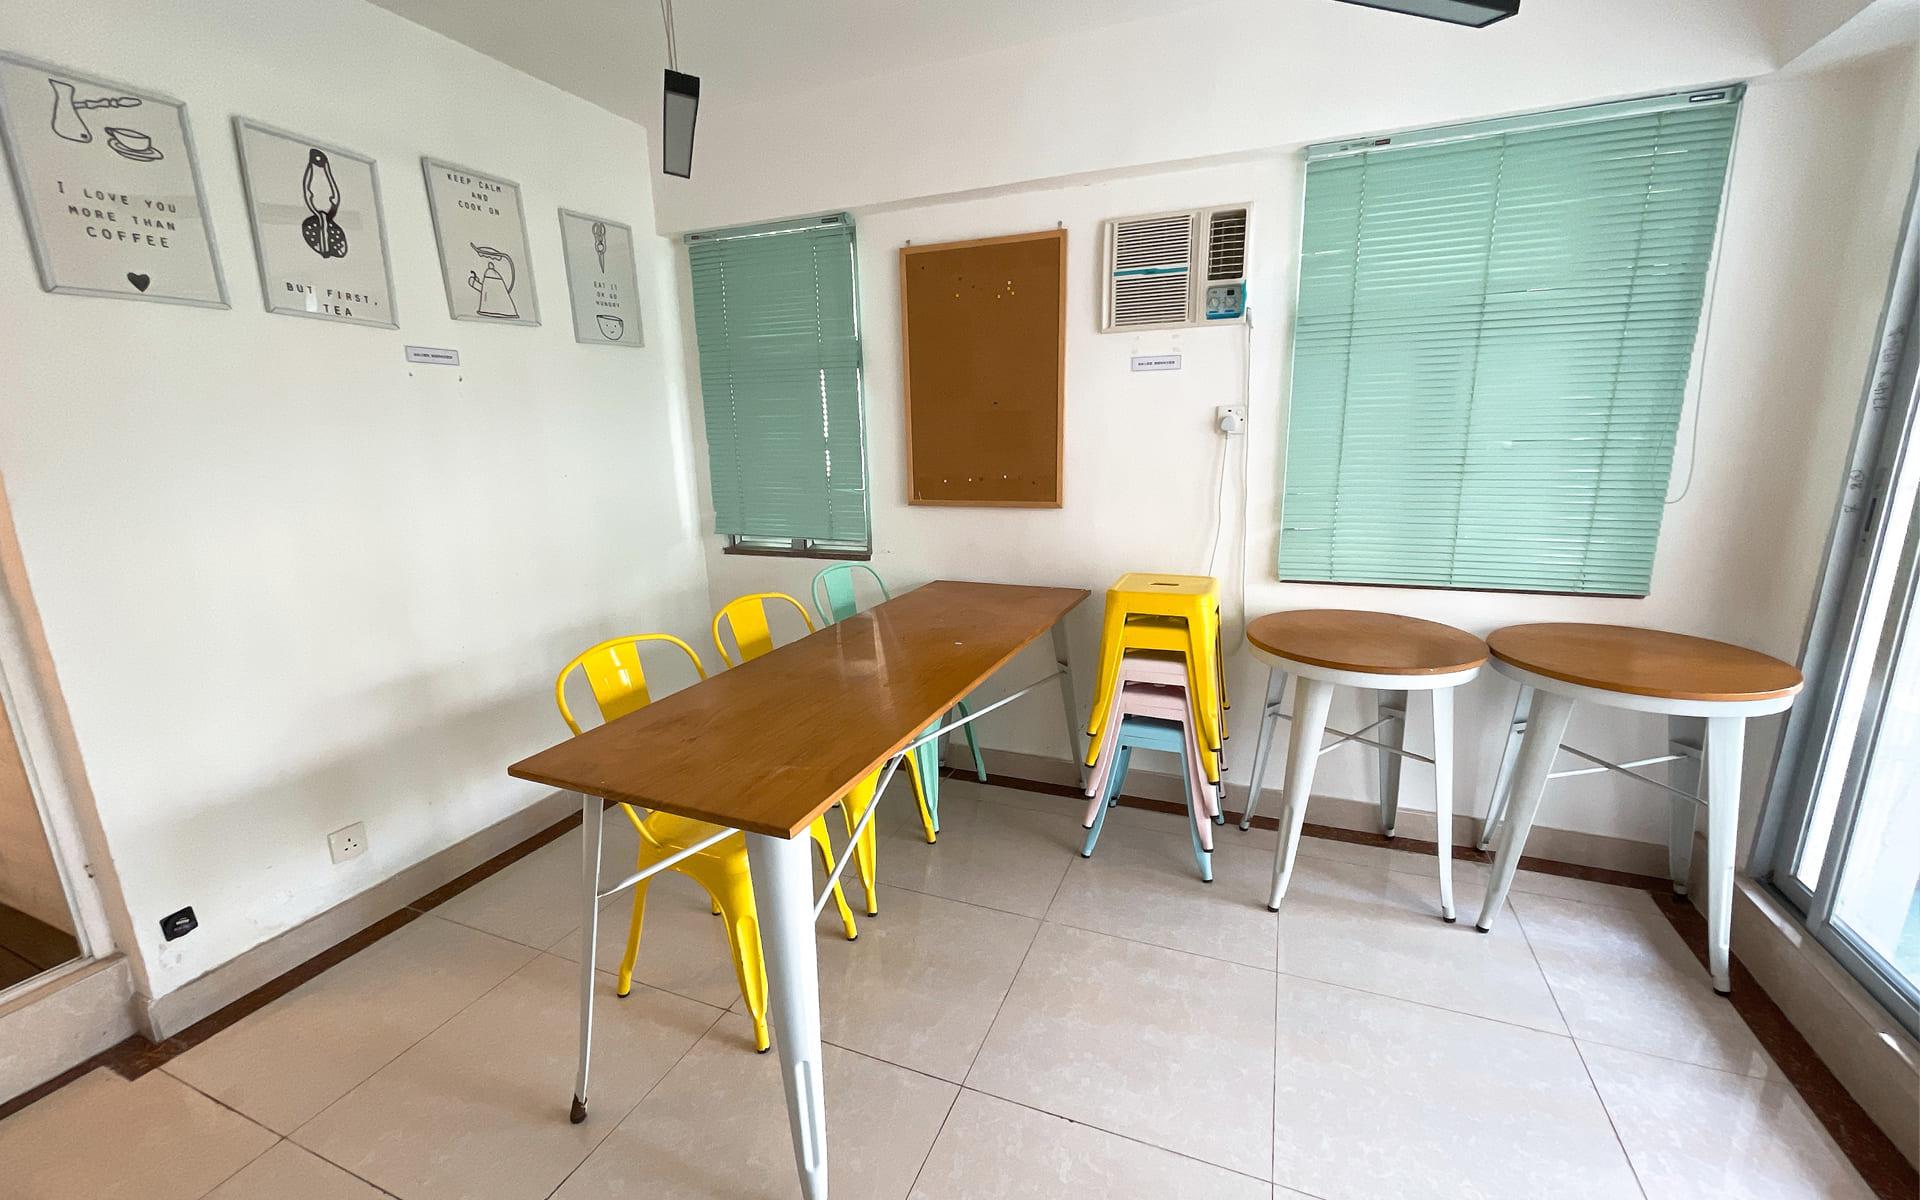 hk_service_apartment_18616179121629432910.jpg